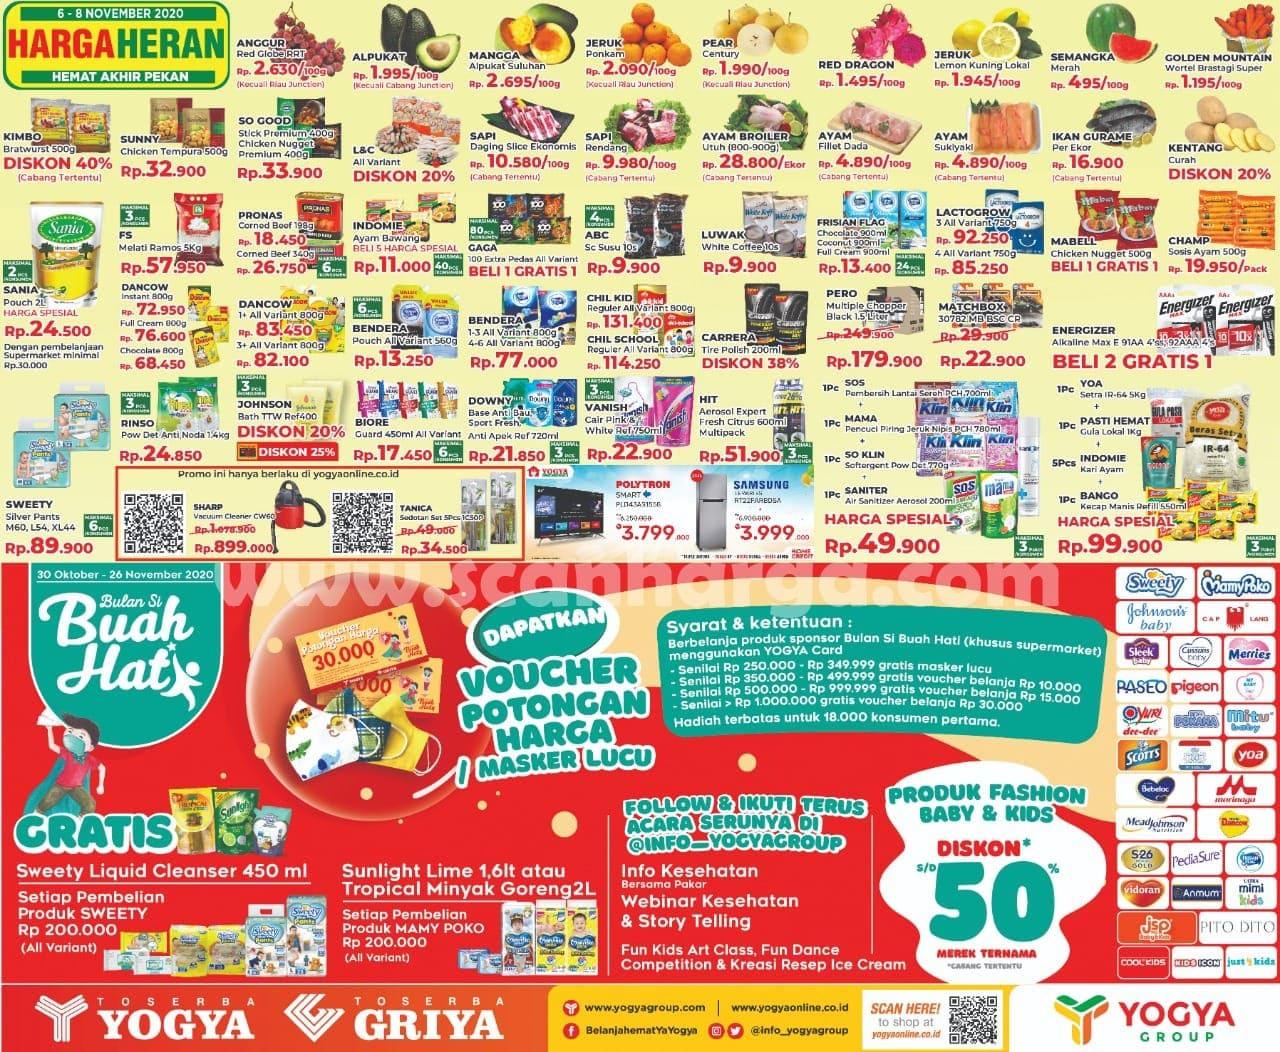 Promo Toserba Yogya Harga Heran [Hemat Akhir Pekan] 6 - 8 November 2020